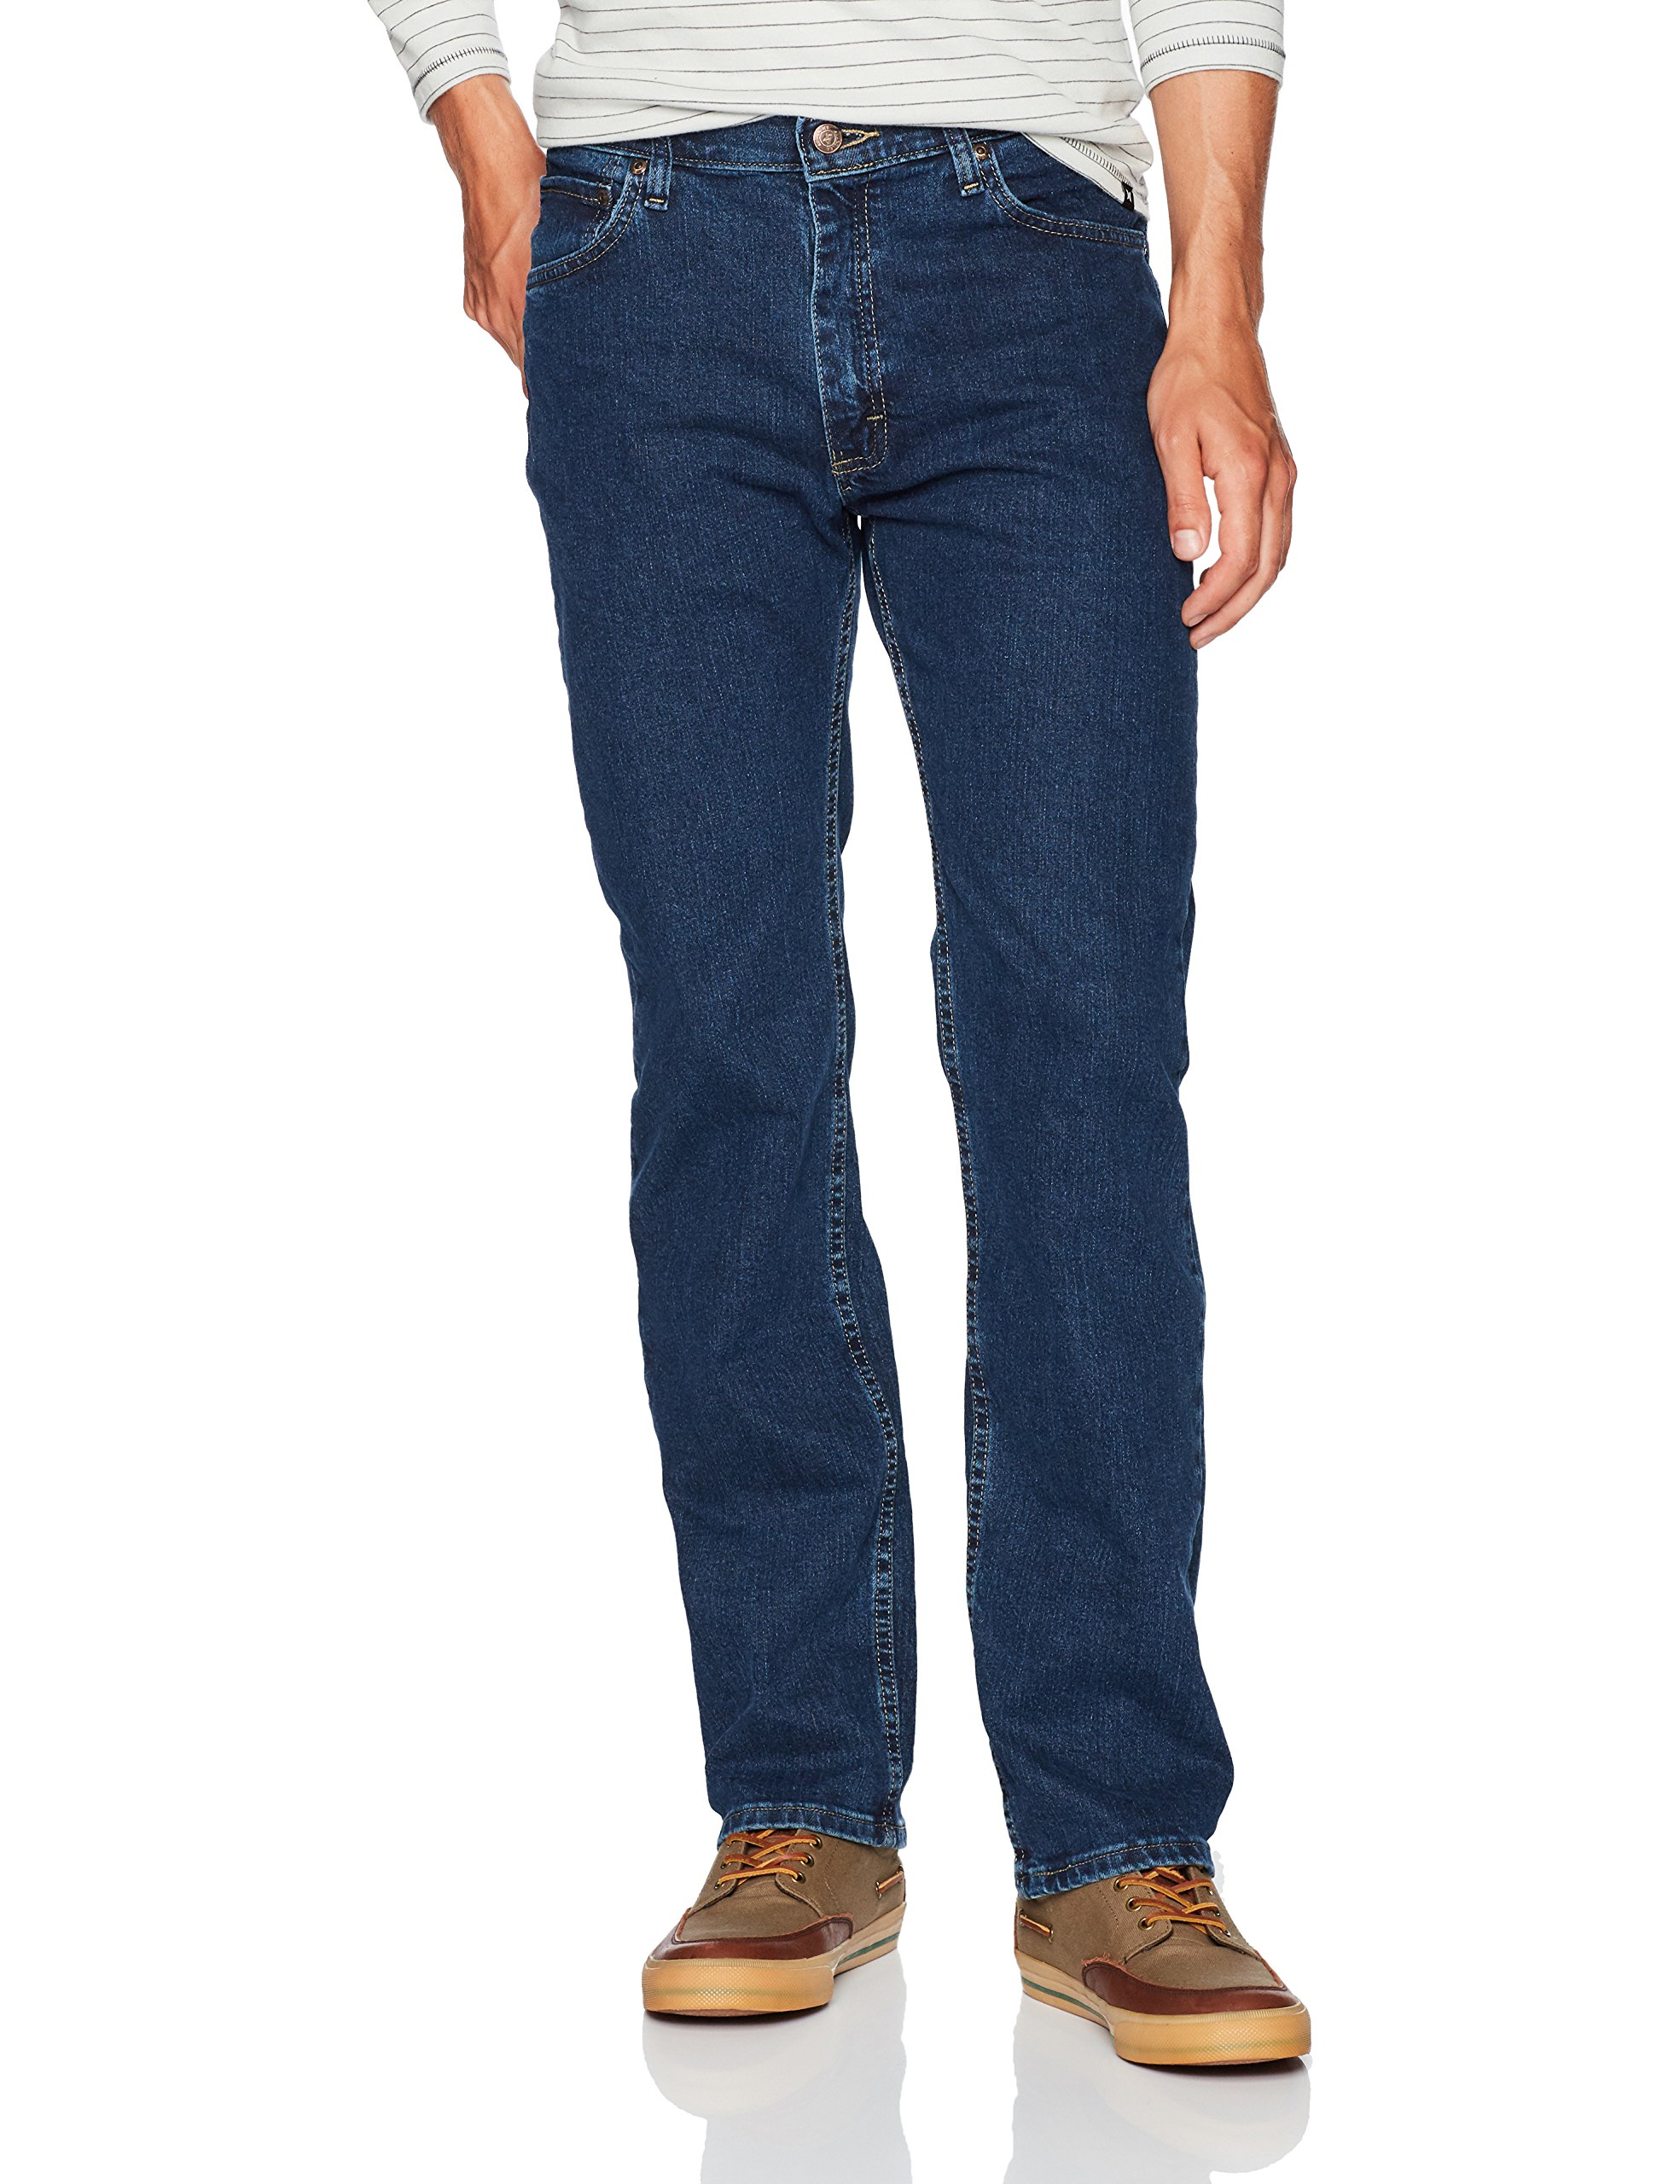 Wrangler Men's Regular Fit Comfort Flex Waist Jean, Dark Stonewash, 38X32 by Wrangler